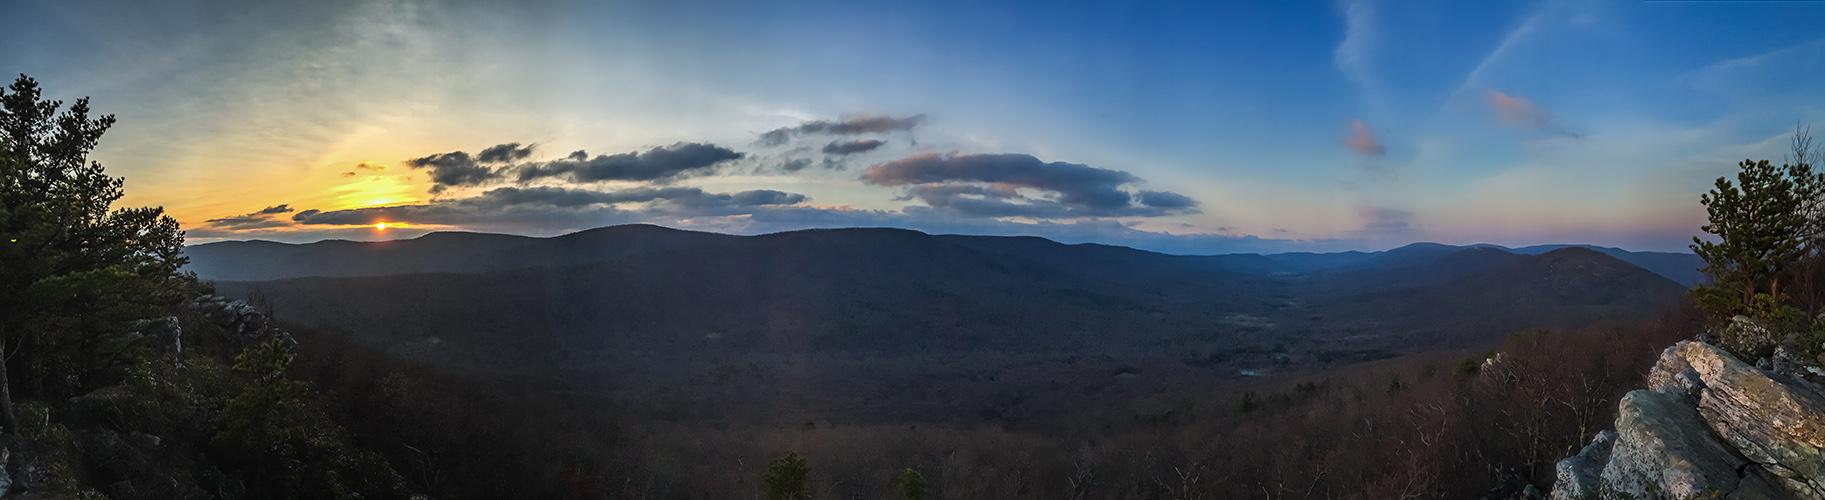 Sunset from Tibbet Knob overlook, George Washington National Forest, West Virginia